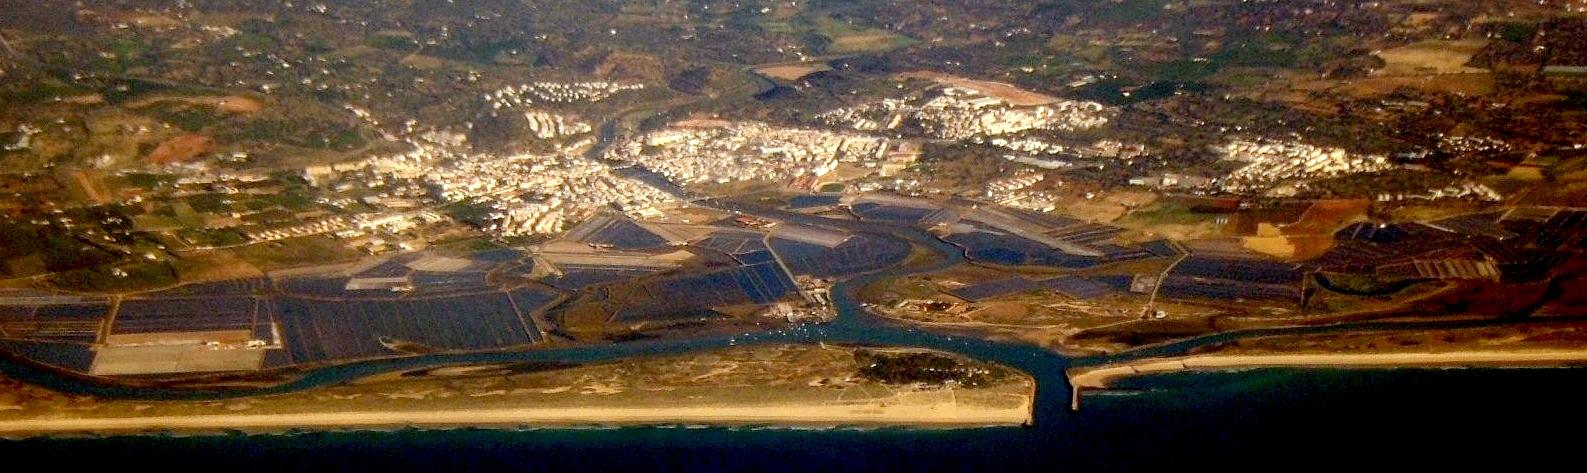 tavira portugal aerial view.jpg